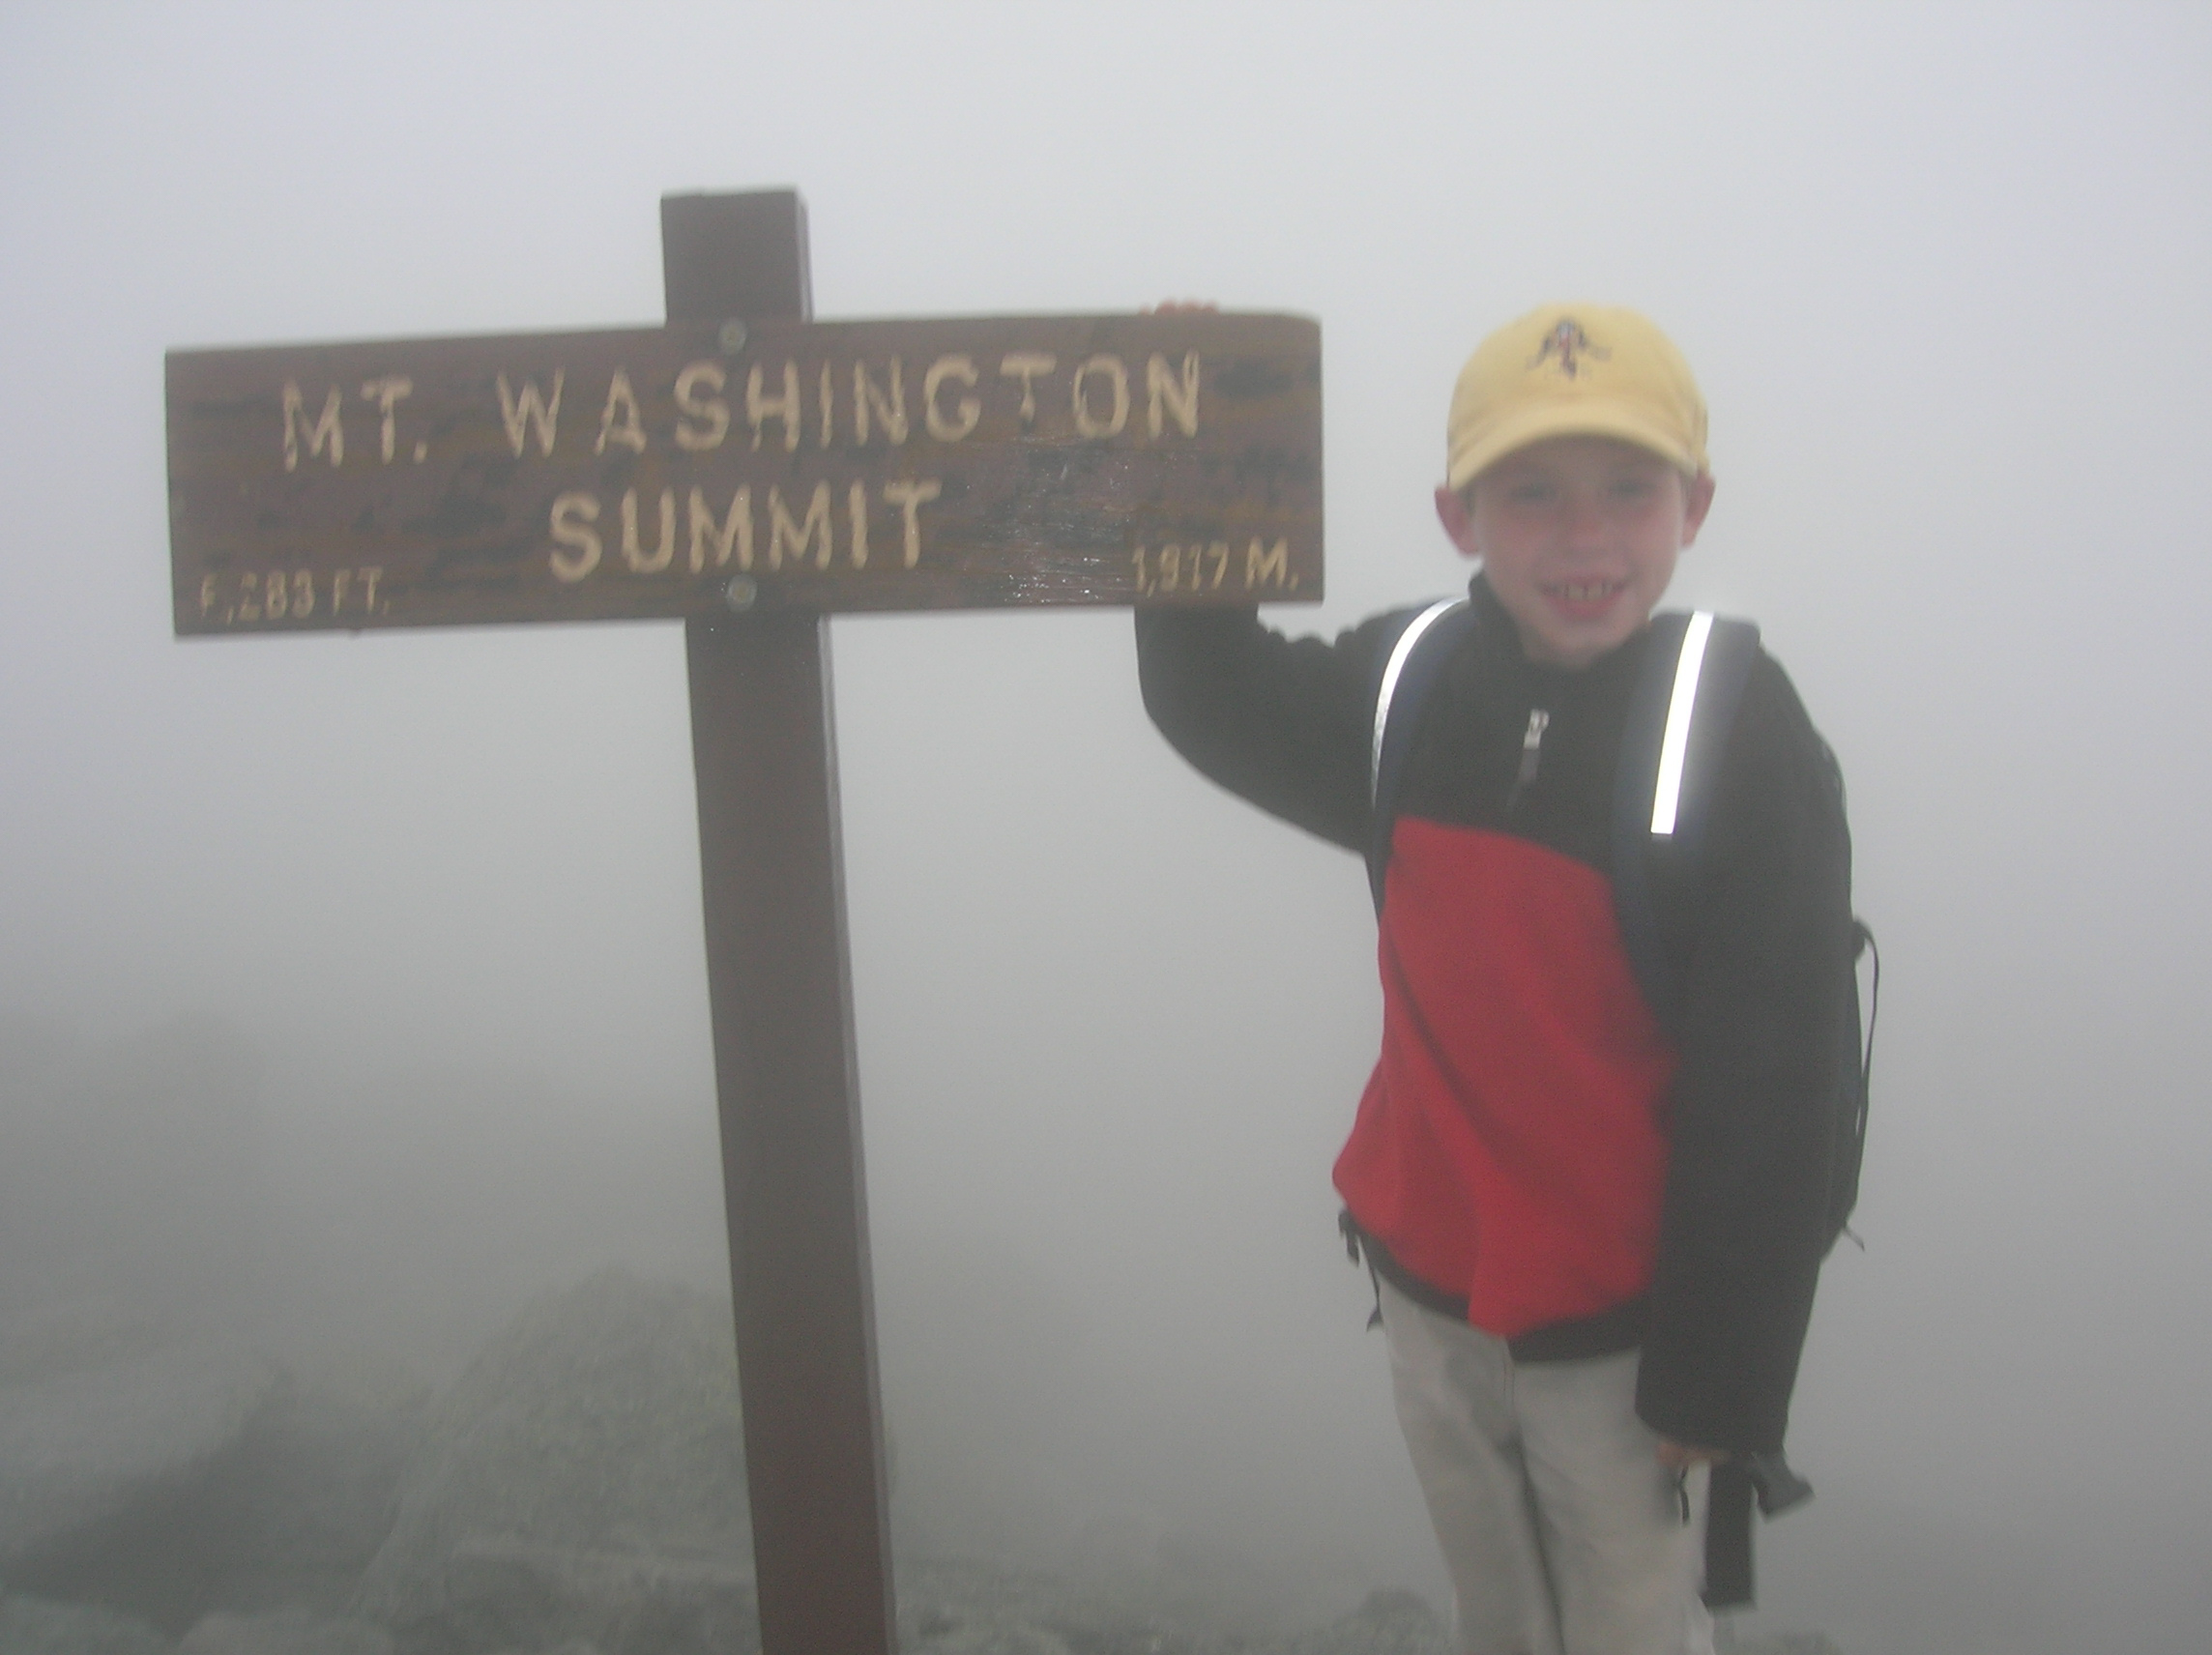 Mt. Washington - August 22, 2006